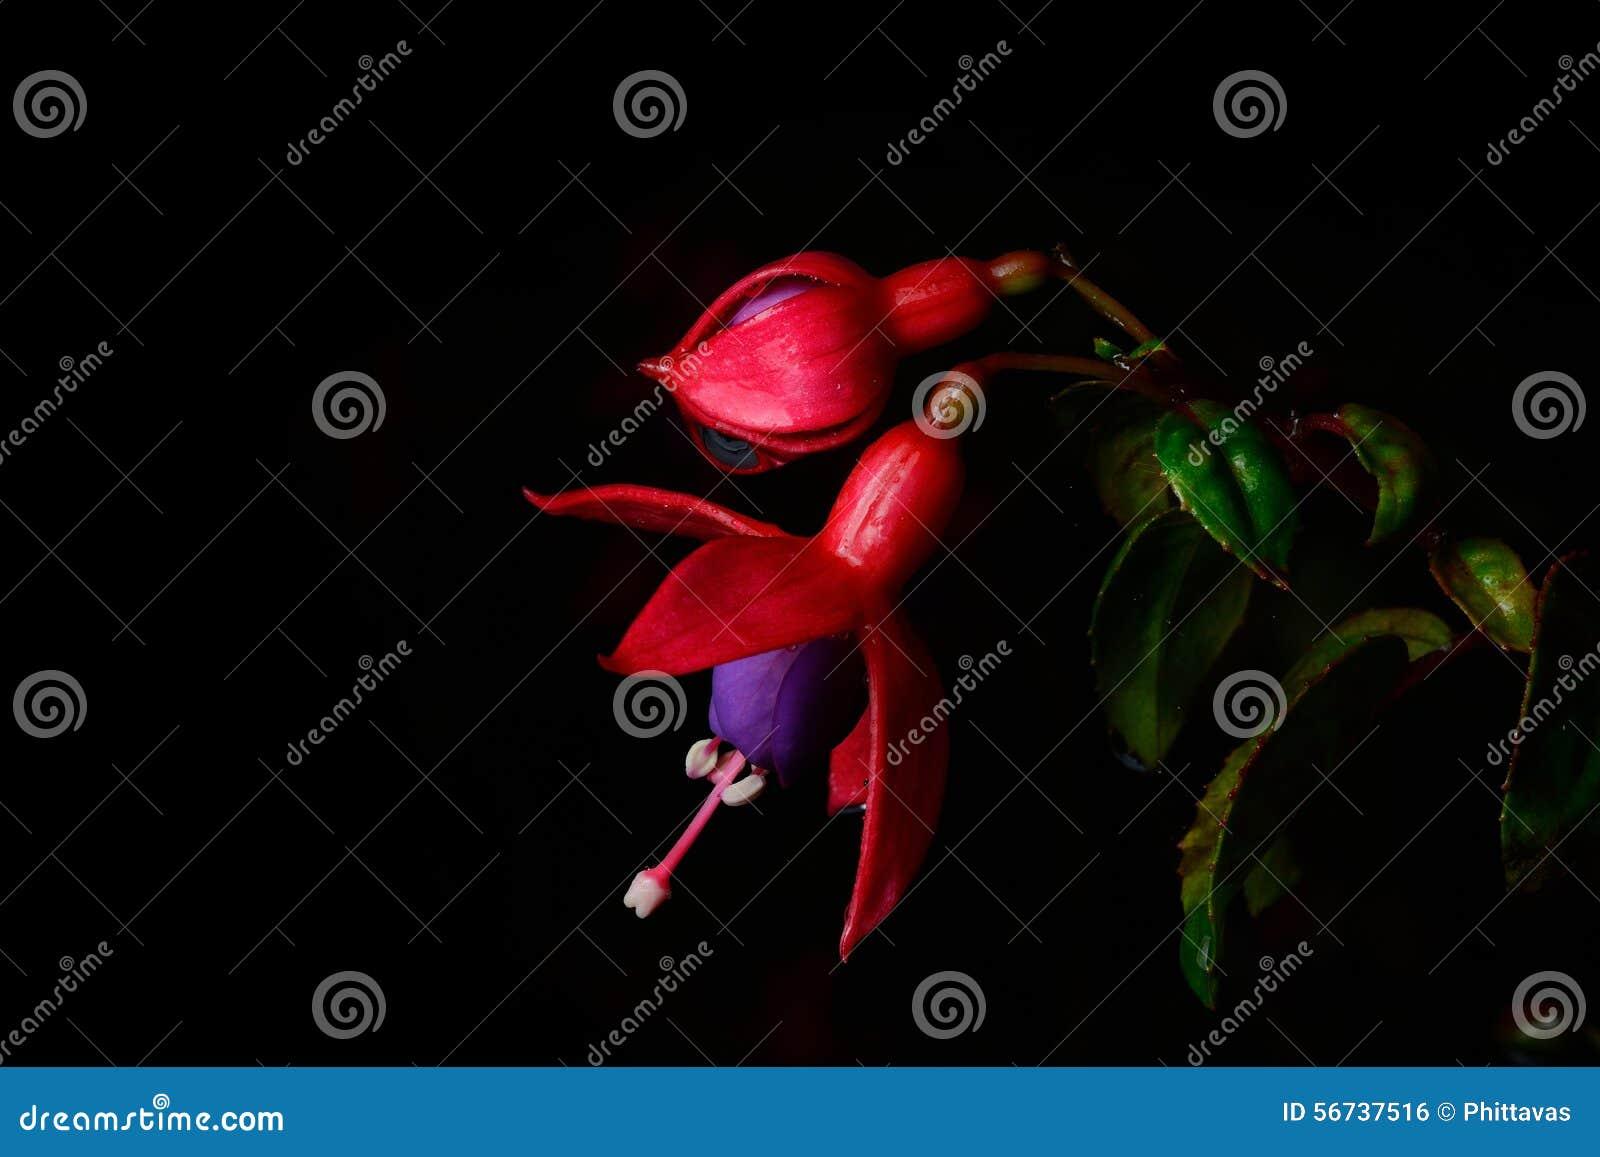 Isolado cor-de-rosa bonito da flor (fúcsia) no fundo preto